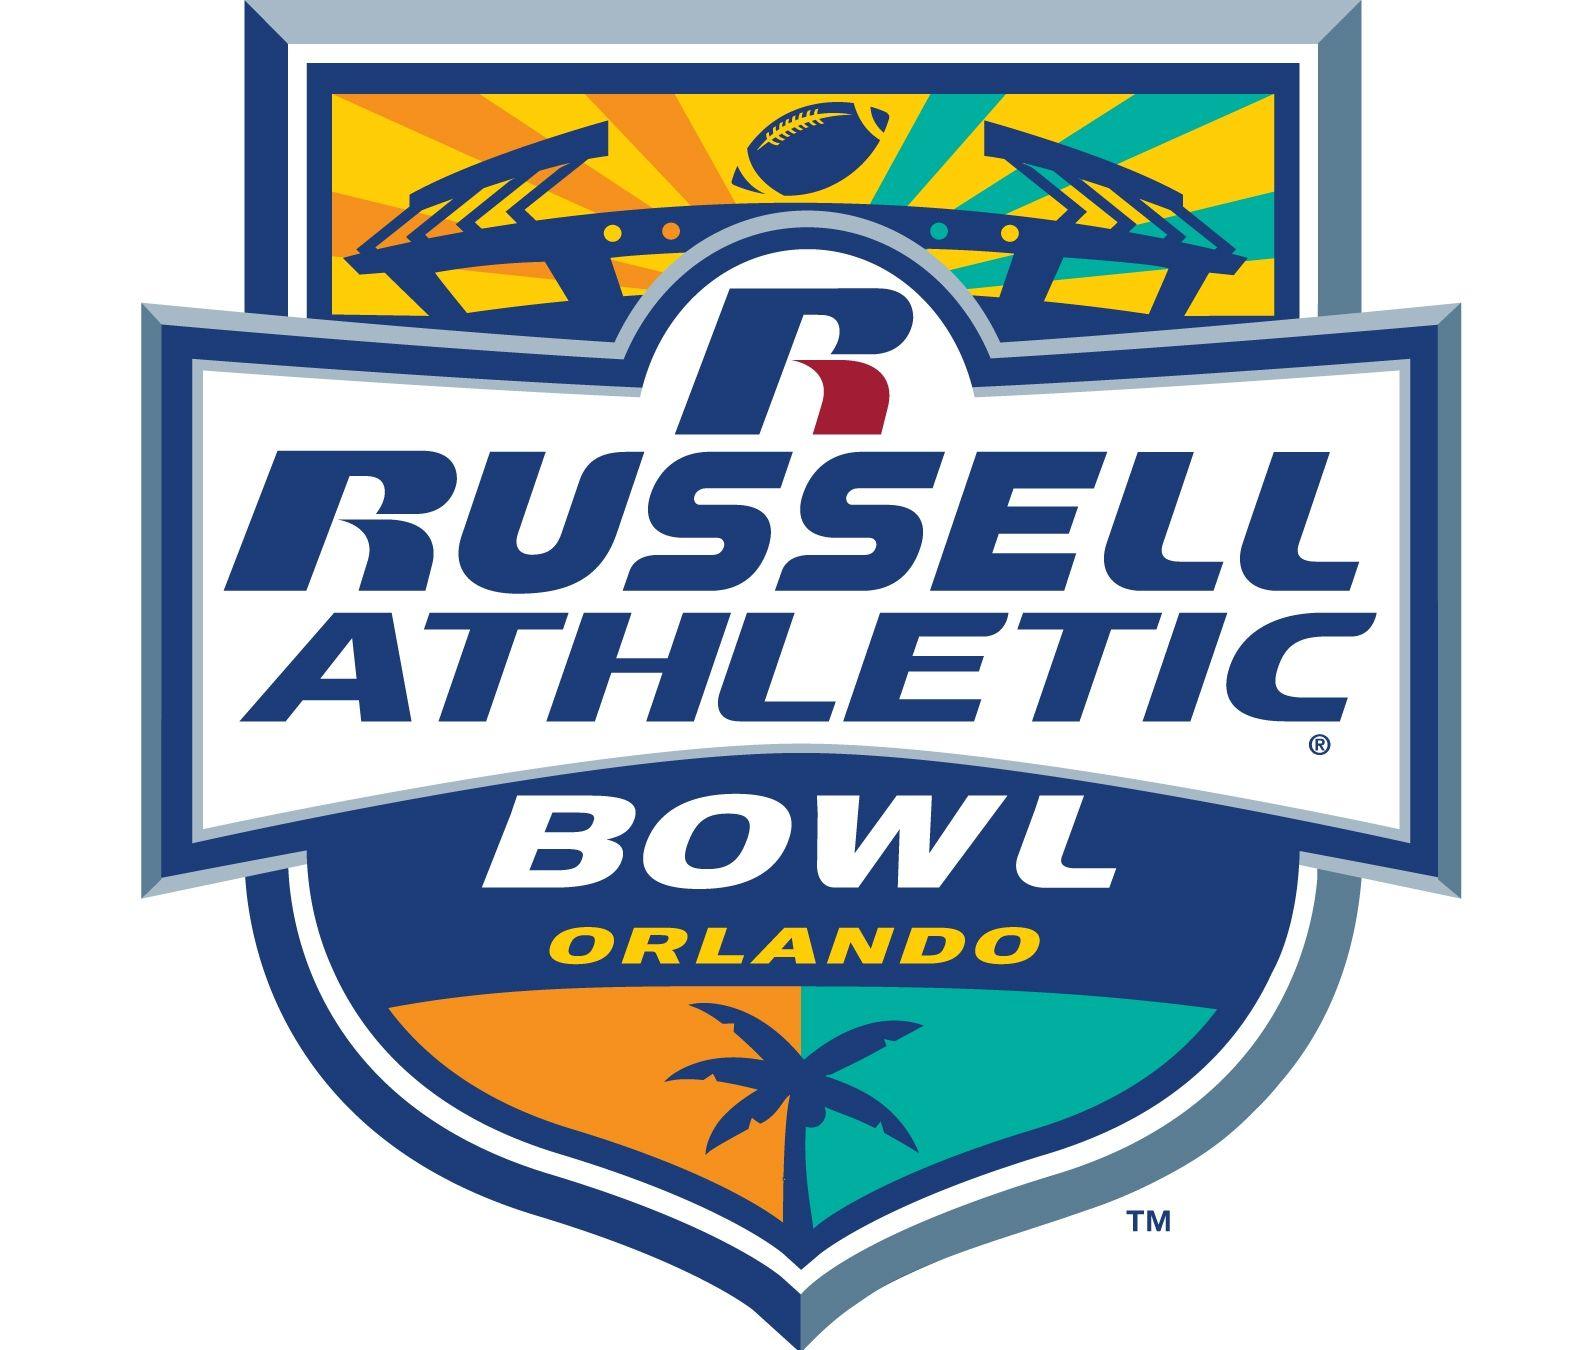 Russell Athletic Bowl Orlando, FL Florida Citrus Bowl